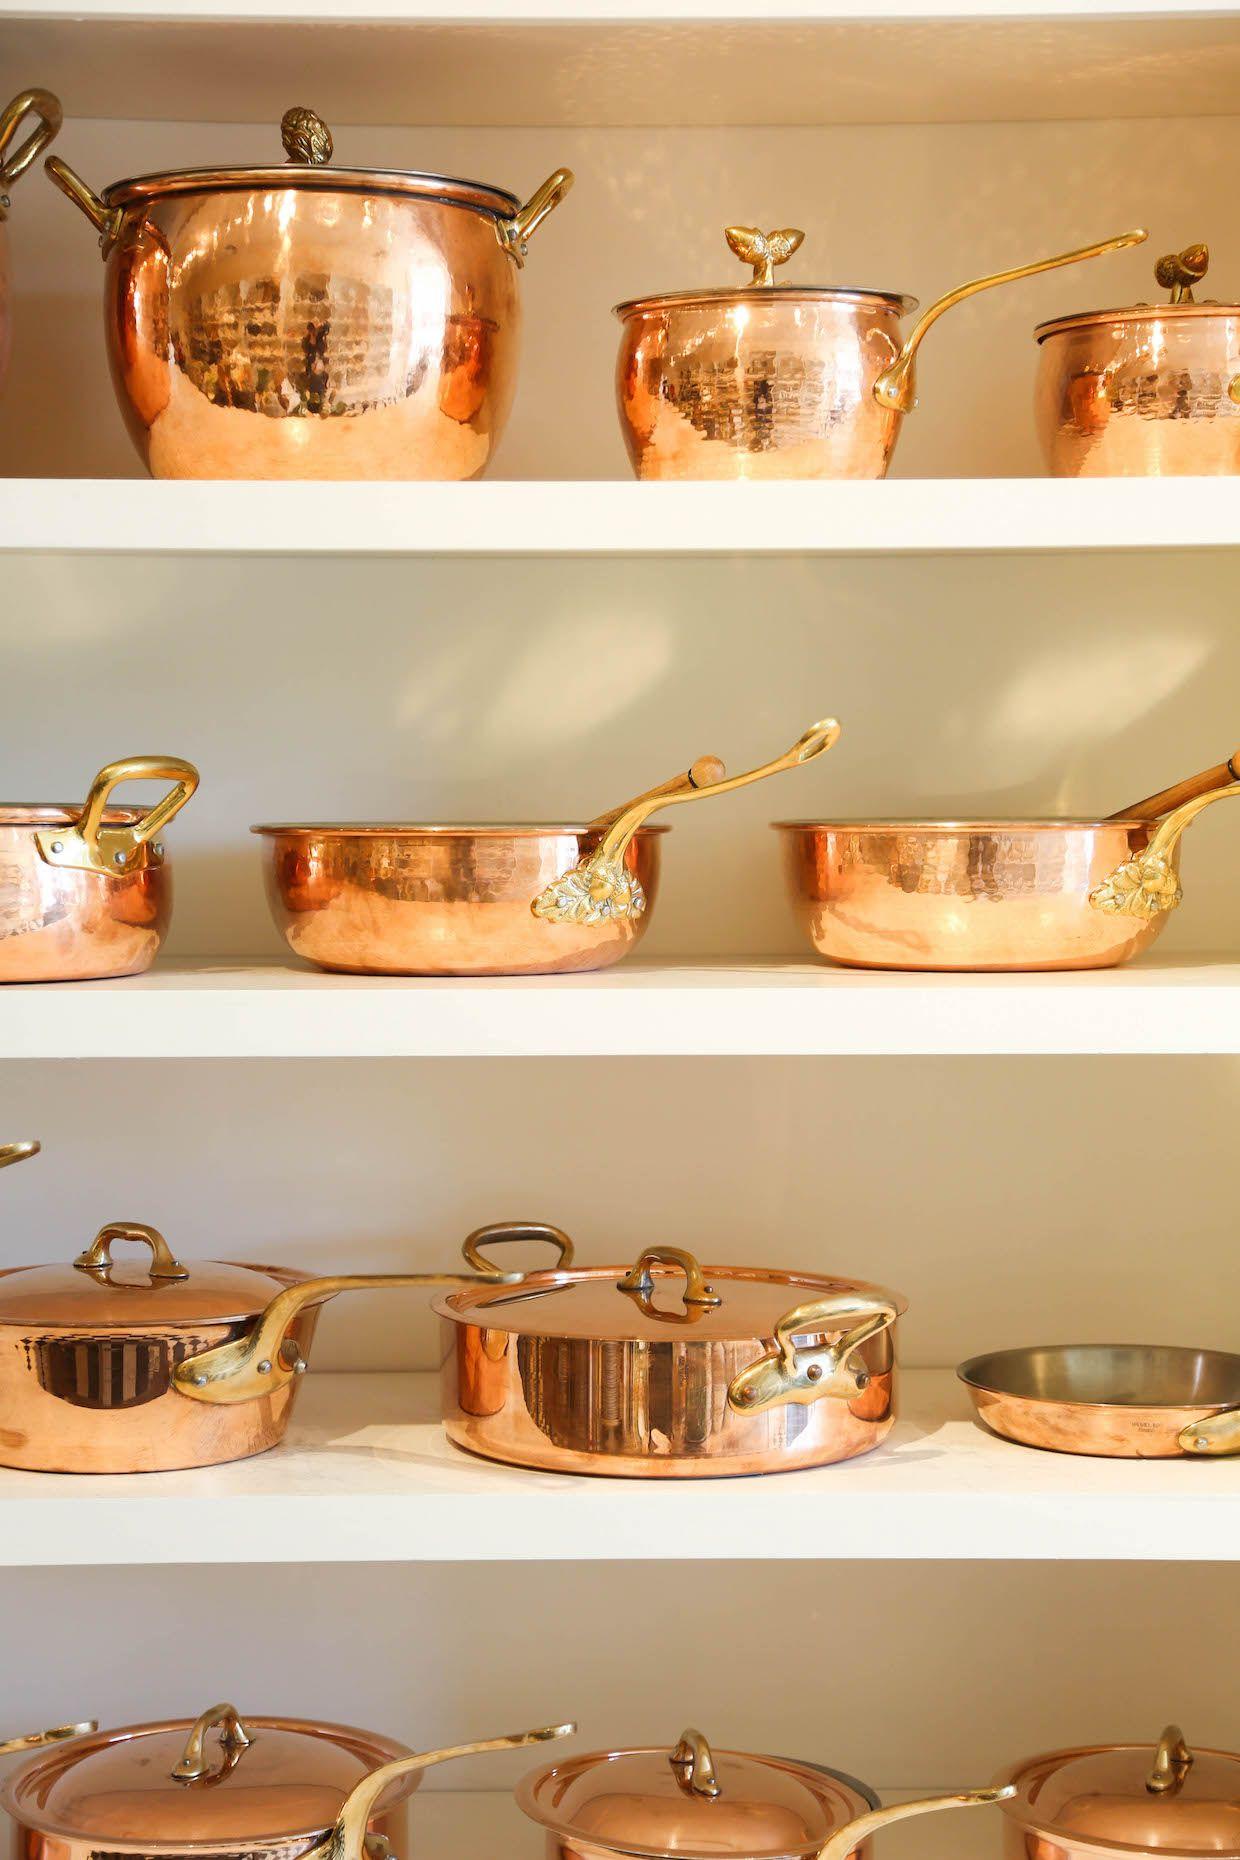 Make Your Home Look Perfect The Most Delicious Interiors You Ll See Today The New Potato Copper Kitchen Accessories Copper Kitchen Decor Copper Pots